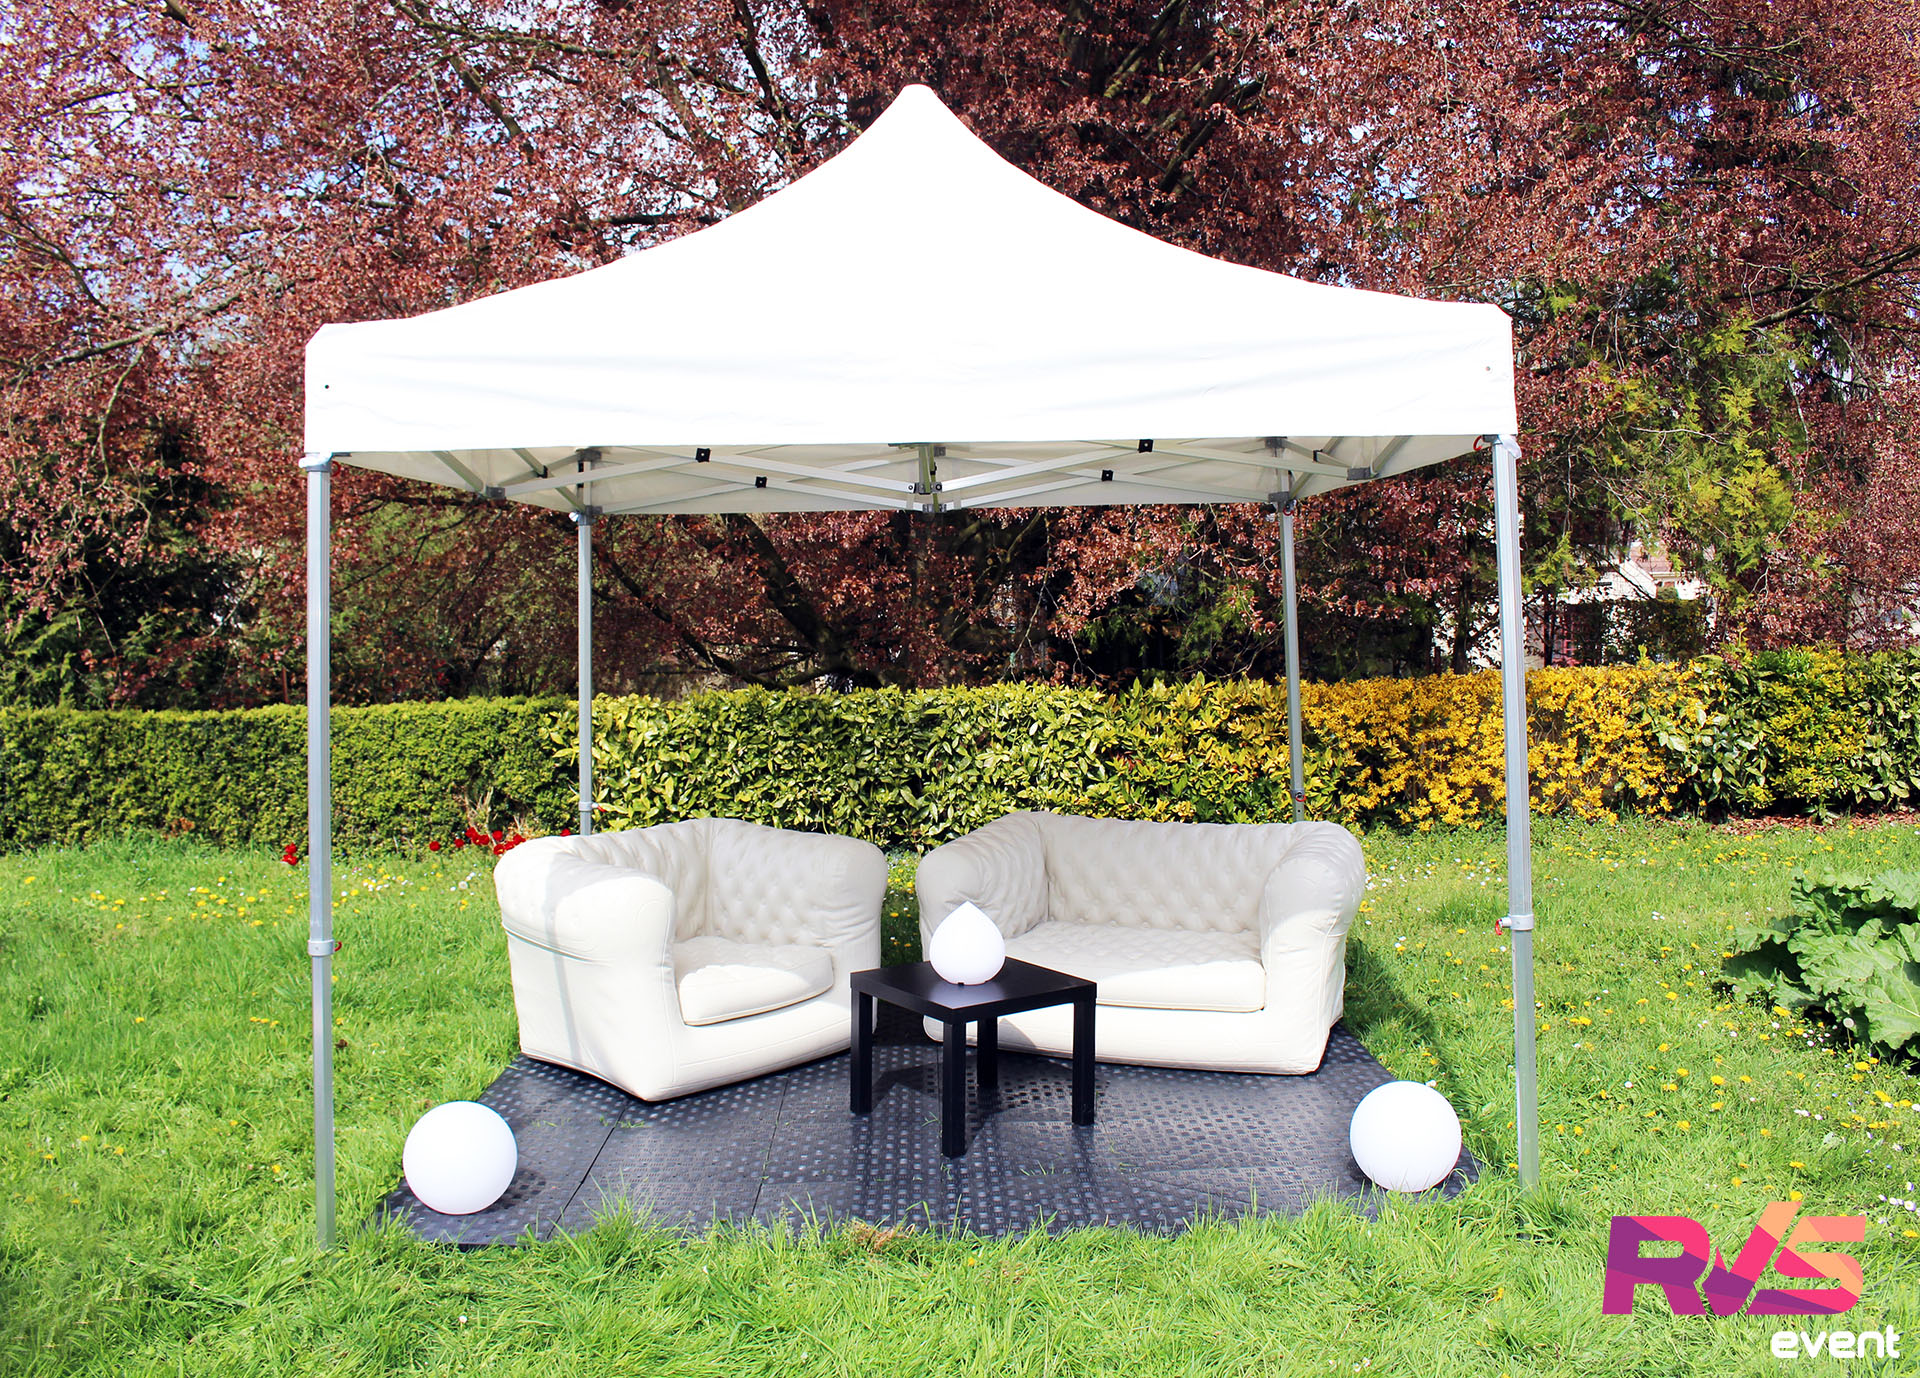 Canapés & Fauteuils Chesterfield & Tables & Boules lumineuses & Gouttes lumineuses & Tente 3x3 & Sol PVC - RVS Event